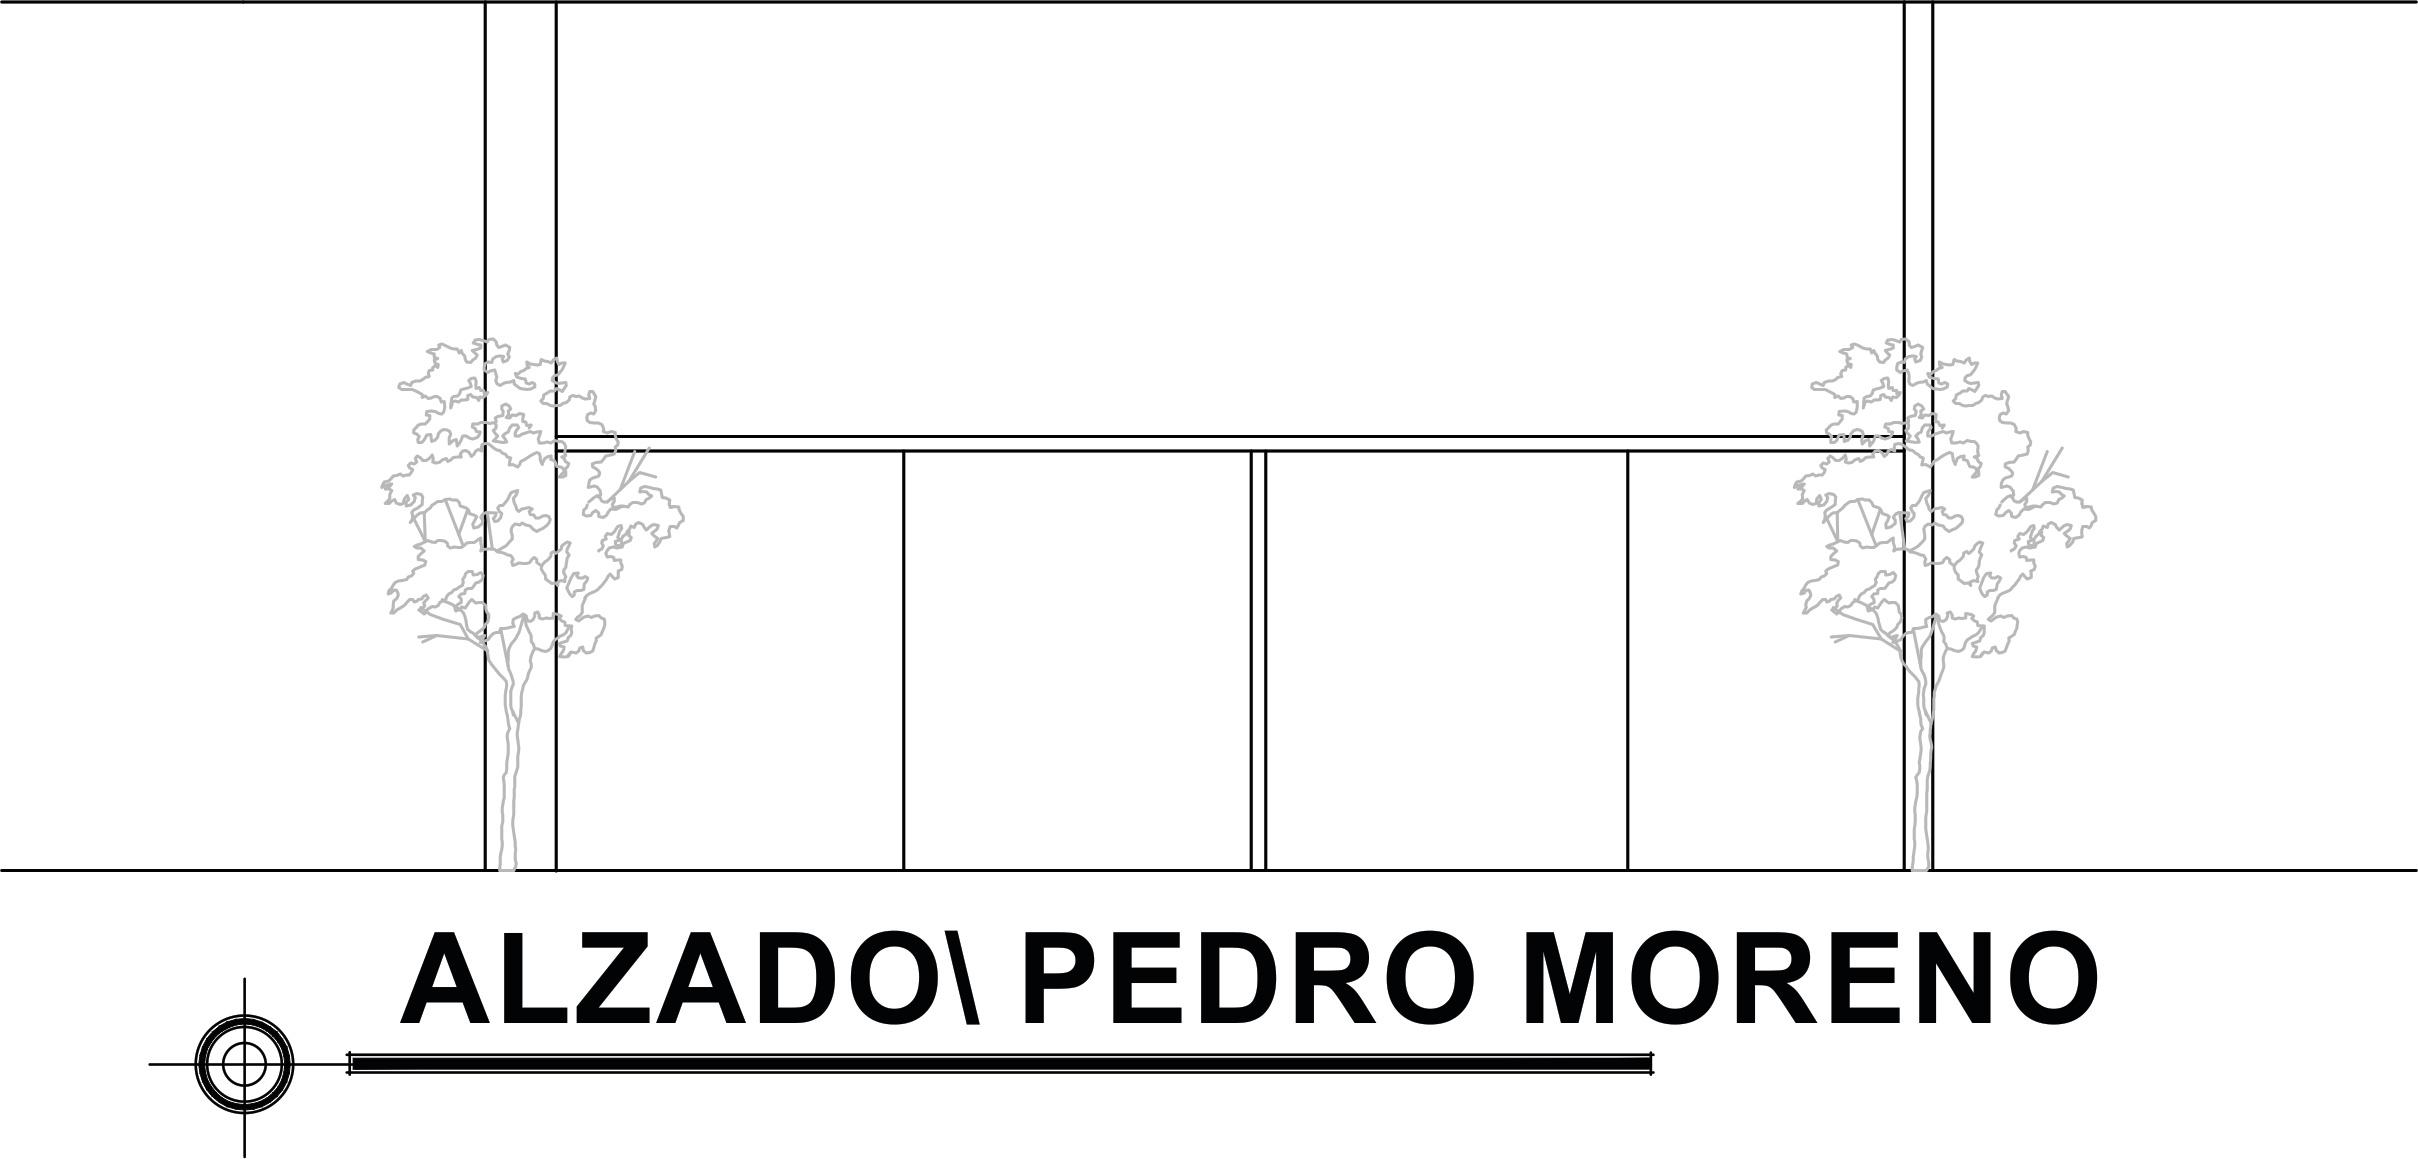 ALZADO PEDRO MORENO